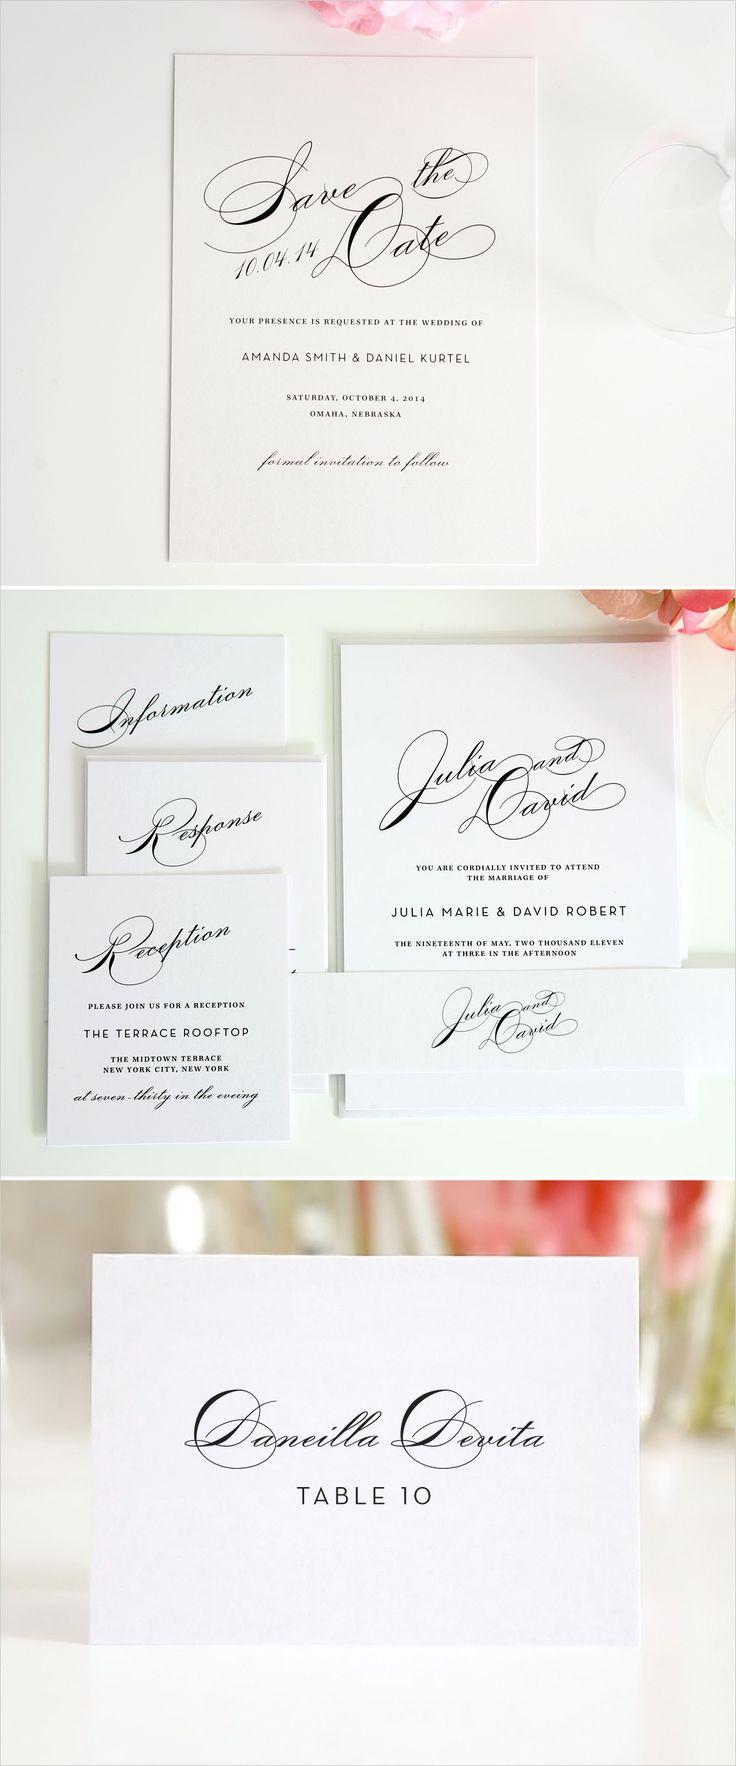 modern vintage glam wedding invitations #vintage #stationery #invitations #script http://www.shineweddinginvitations.com/wedding-invitations/vintage-glam-wedding-invitations